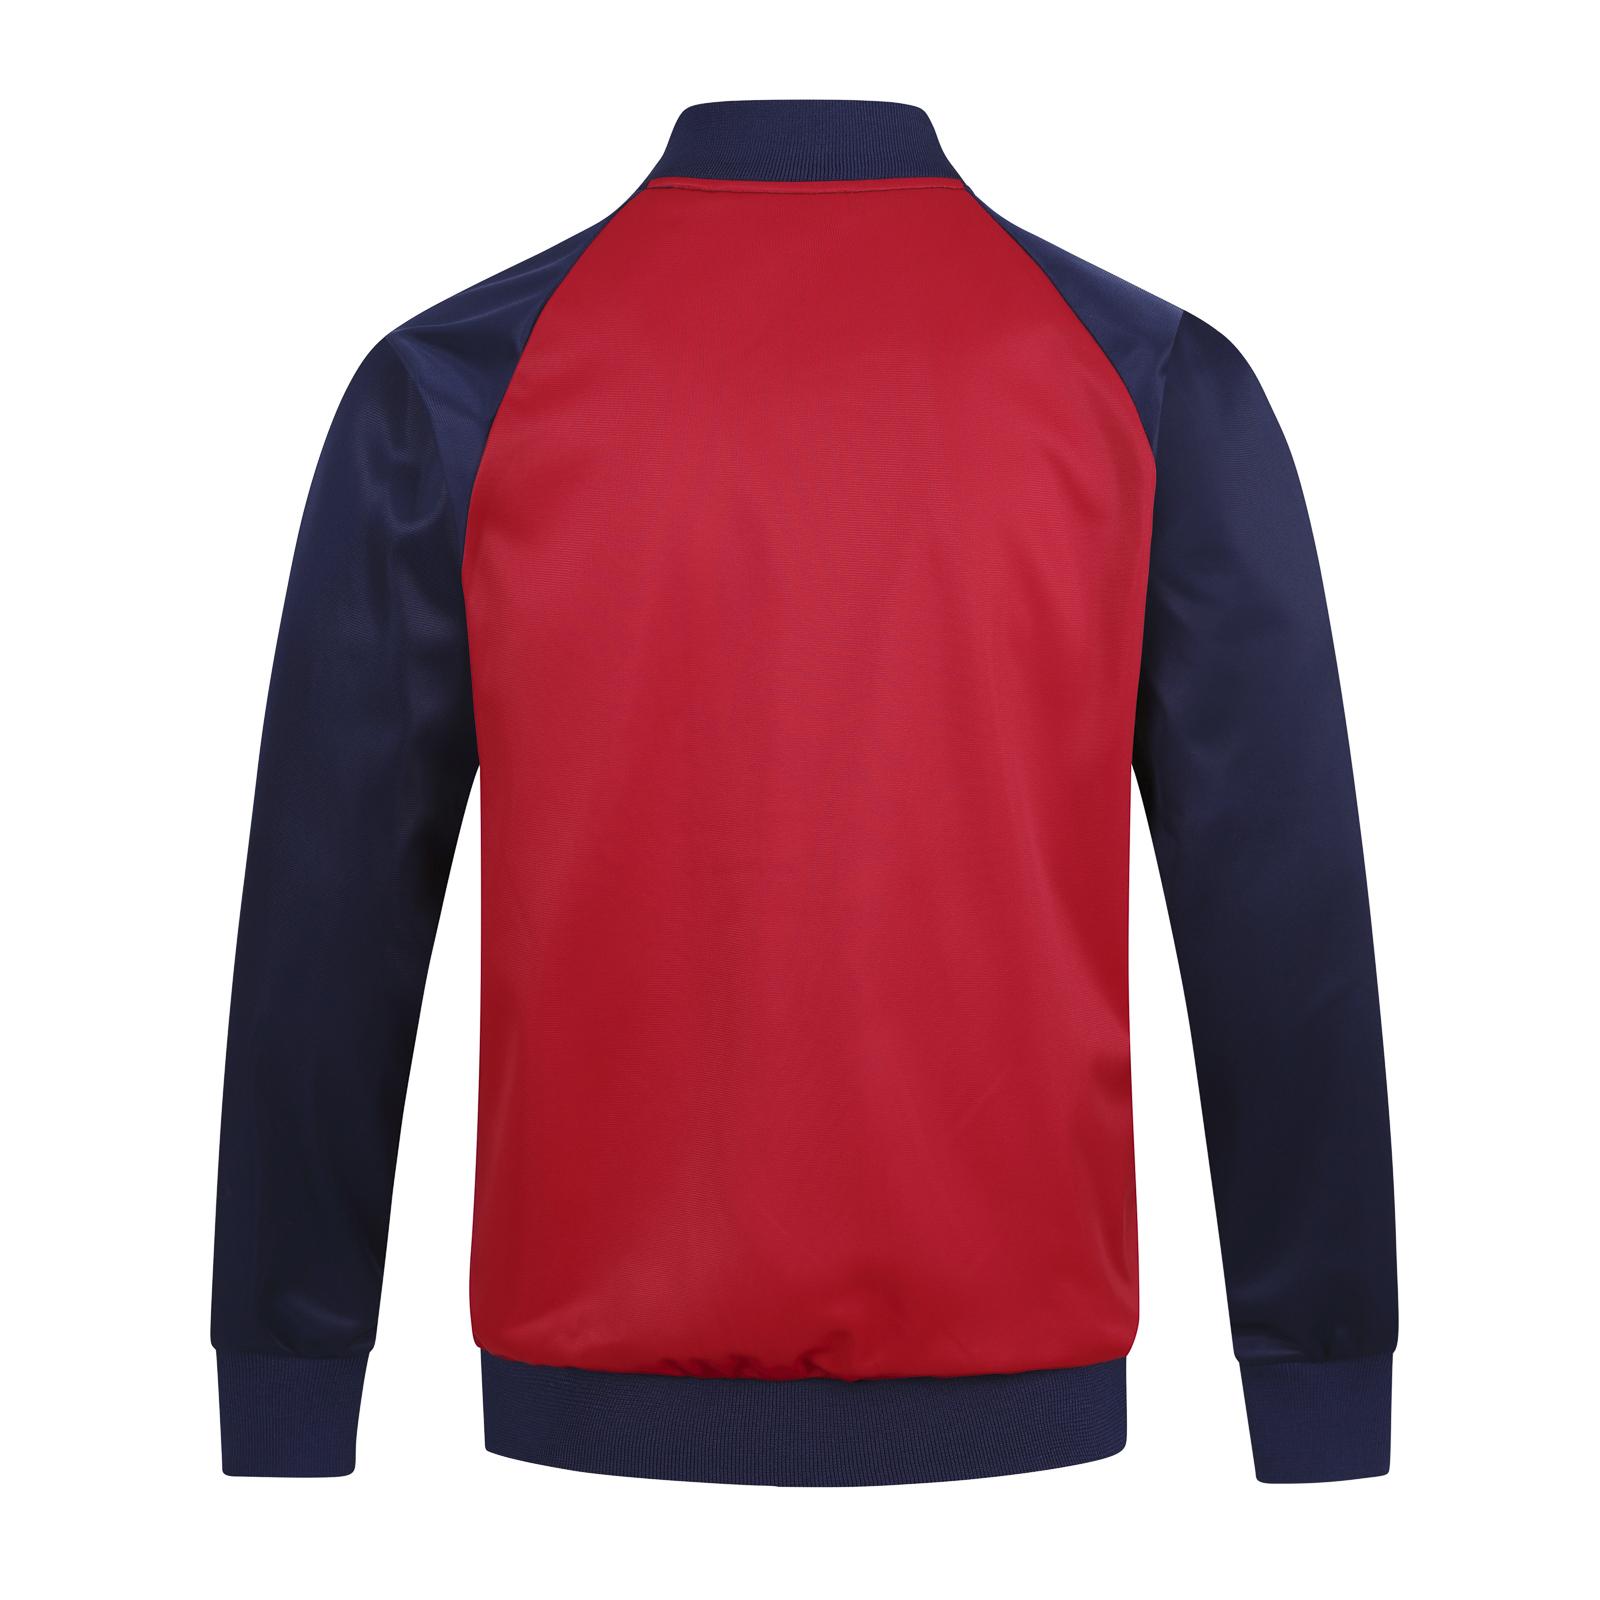 Arsenal-FC-Official-Football-Gift-Mens-Retro-Track-Top-Jacket 縮圖 10